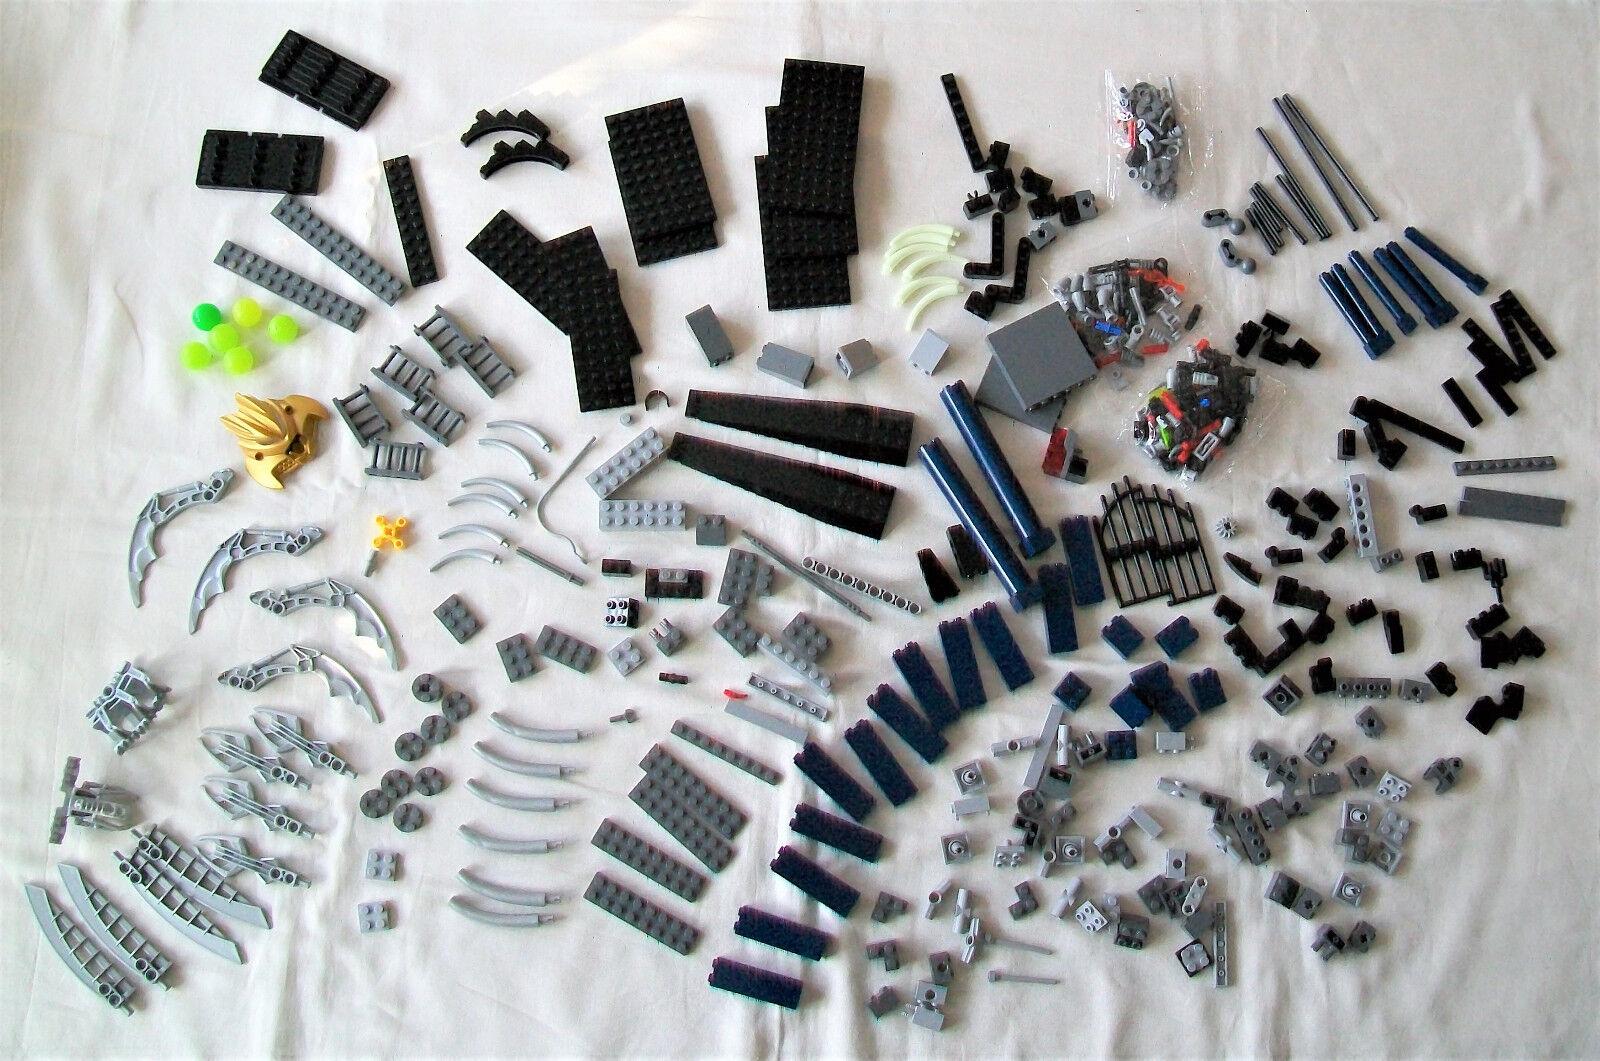 LEGO Bionicles   Technics - Bulk Lot Comprising Varied Selection of Pieces